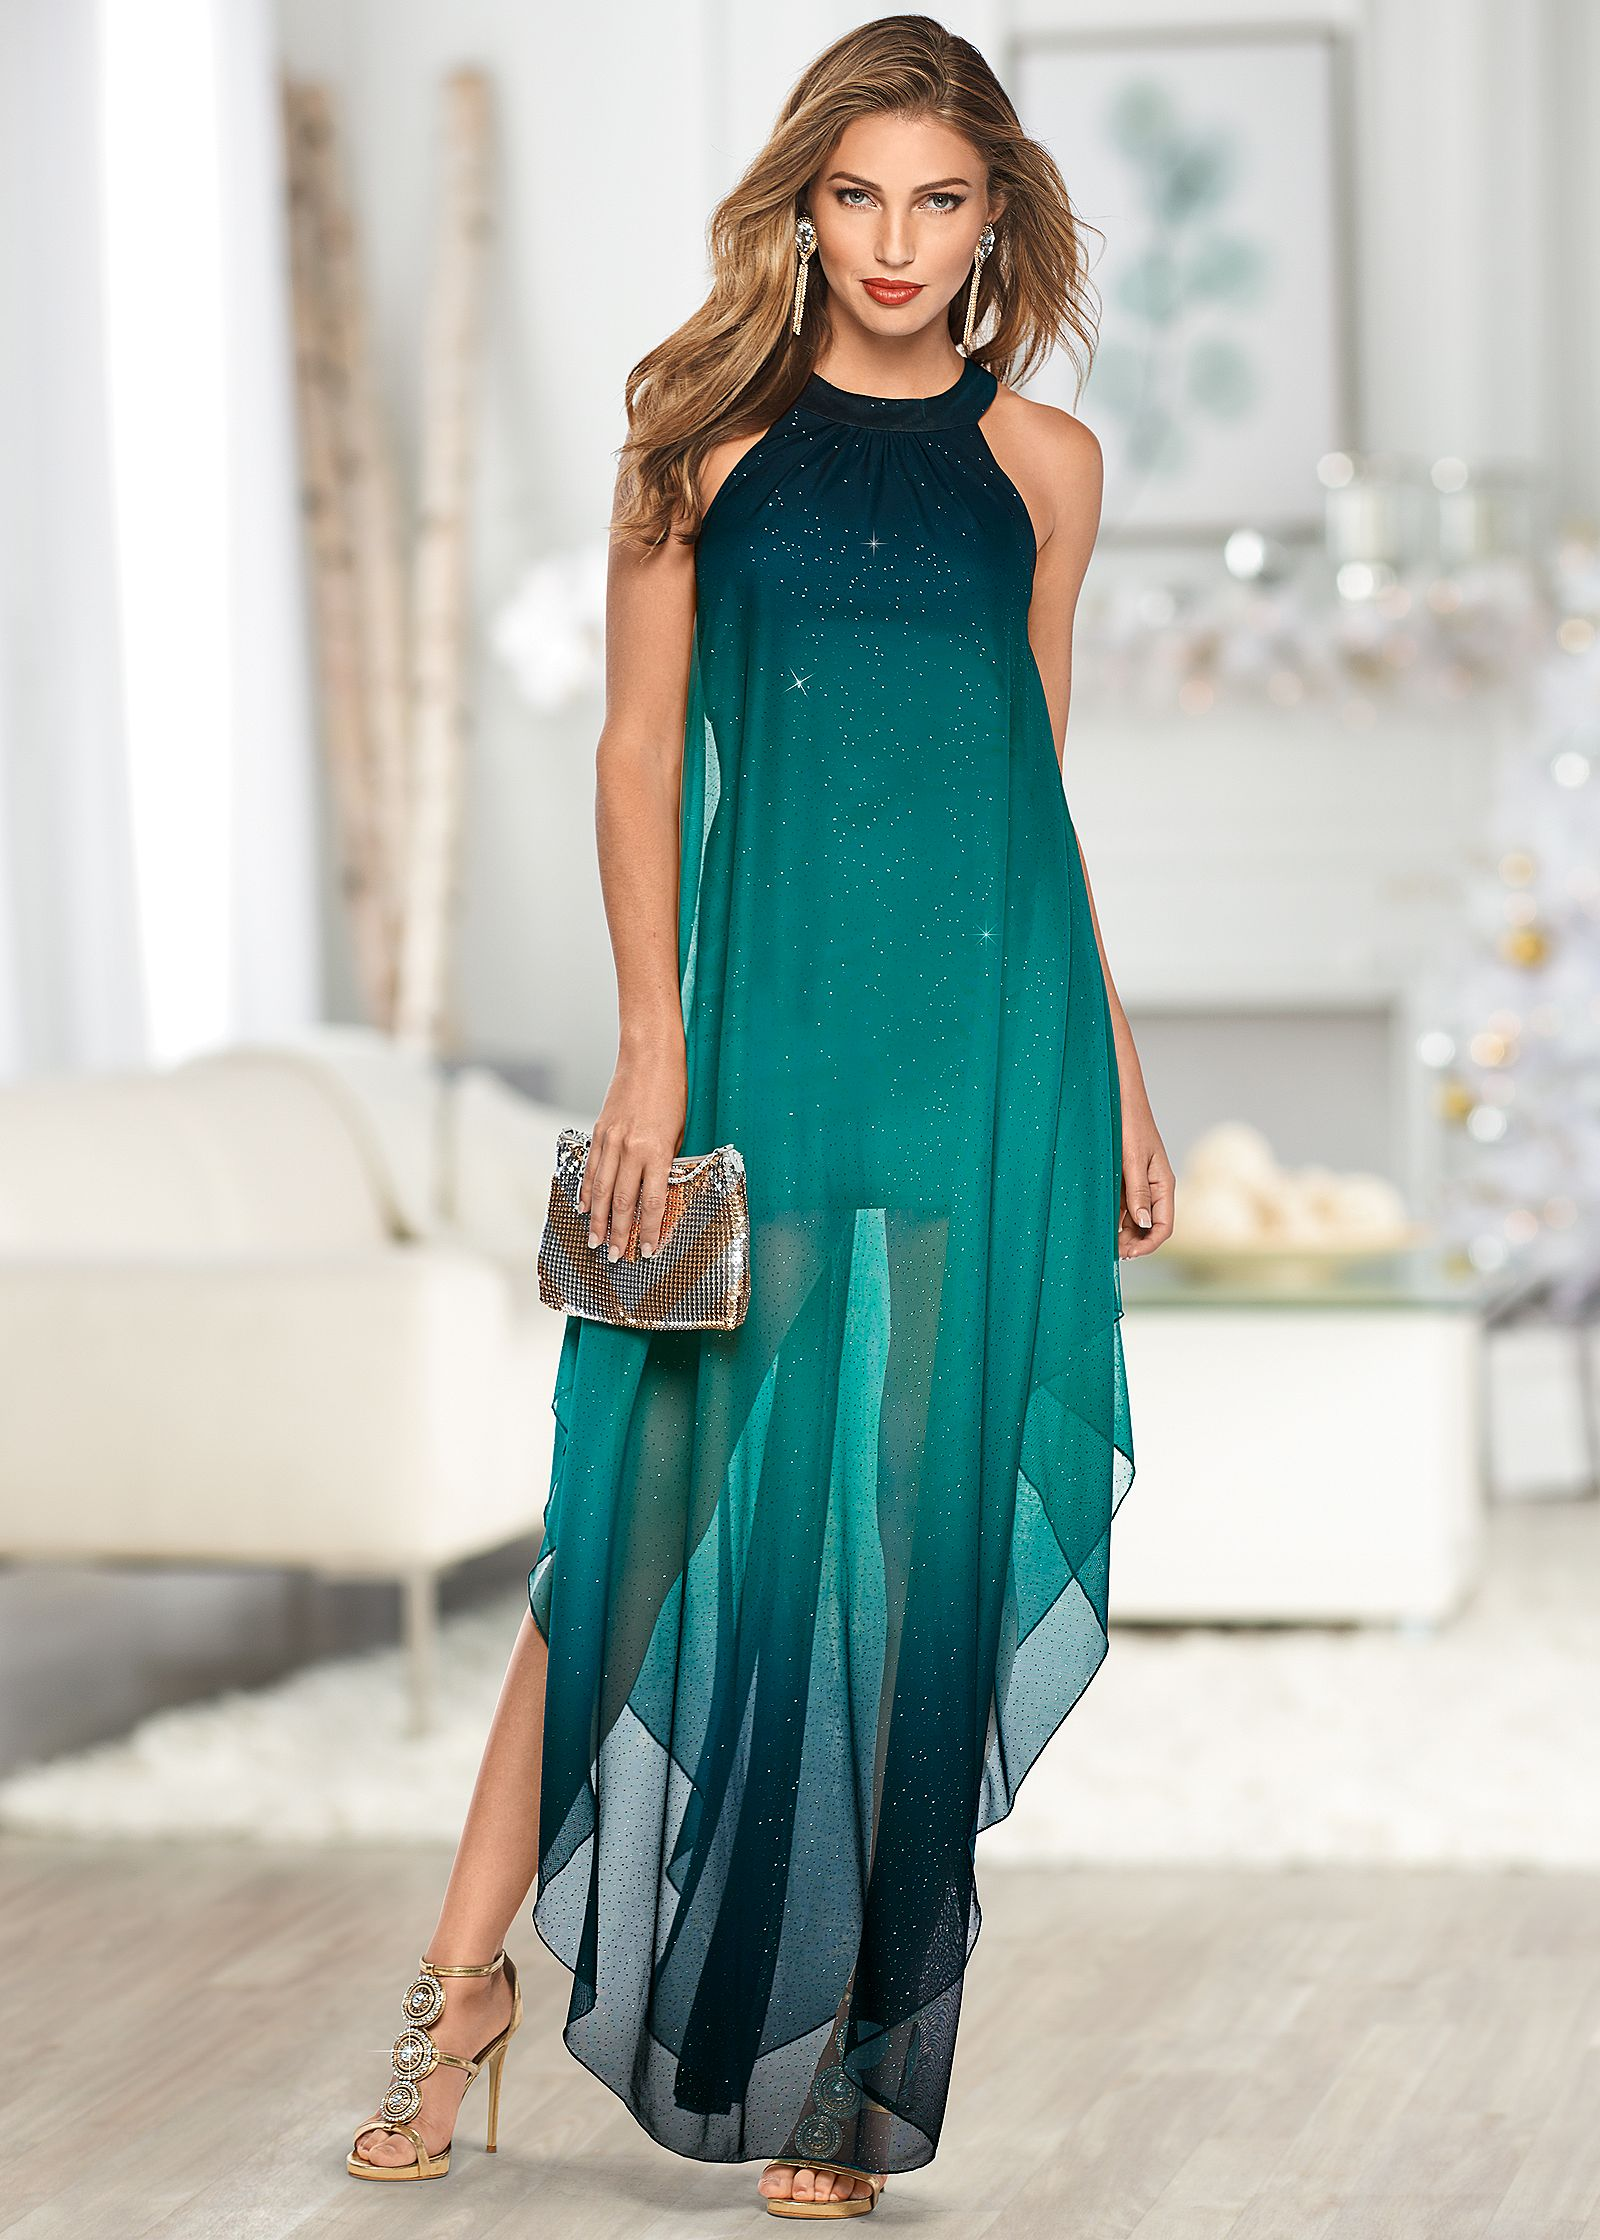 Tiffany Blue Teen Dresses